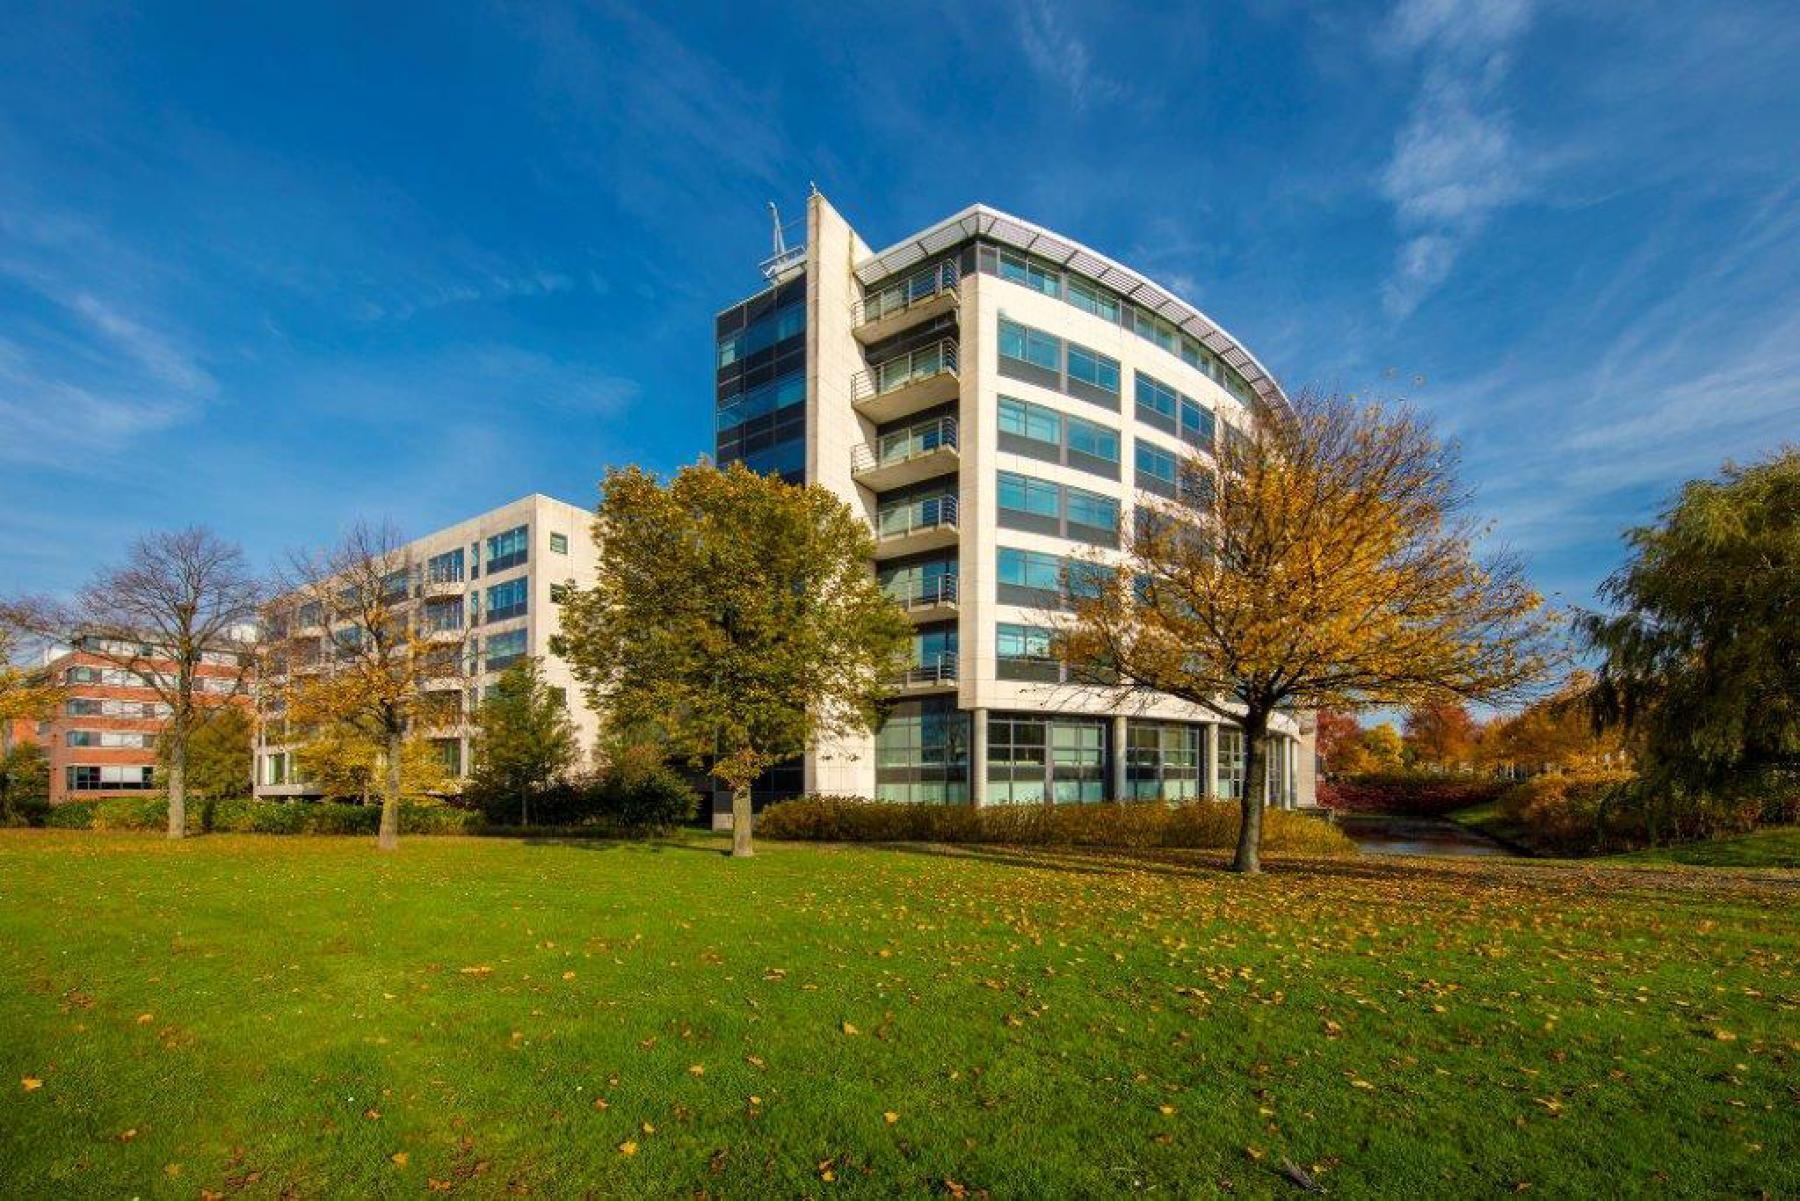 Rent office space Beechavenue 54-62, Schiphol (28)